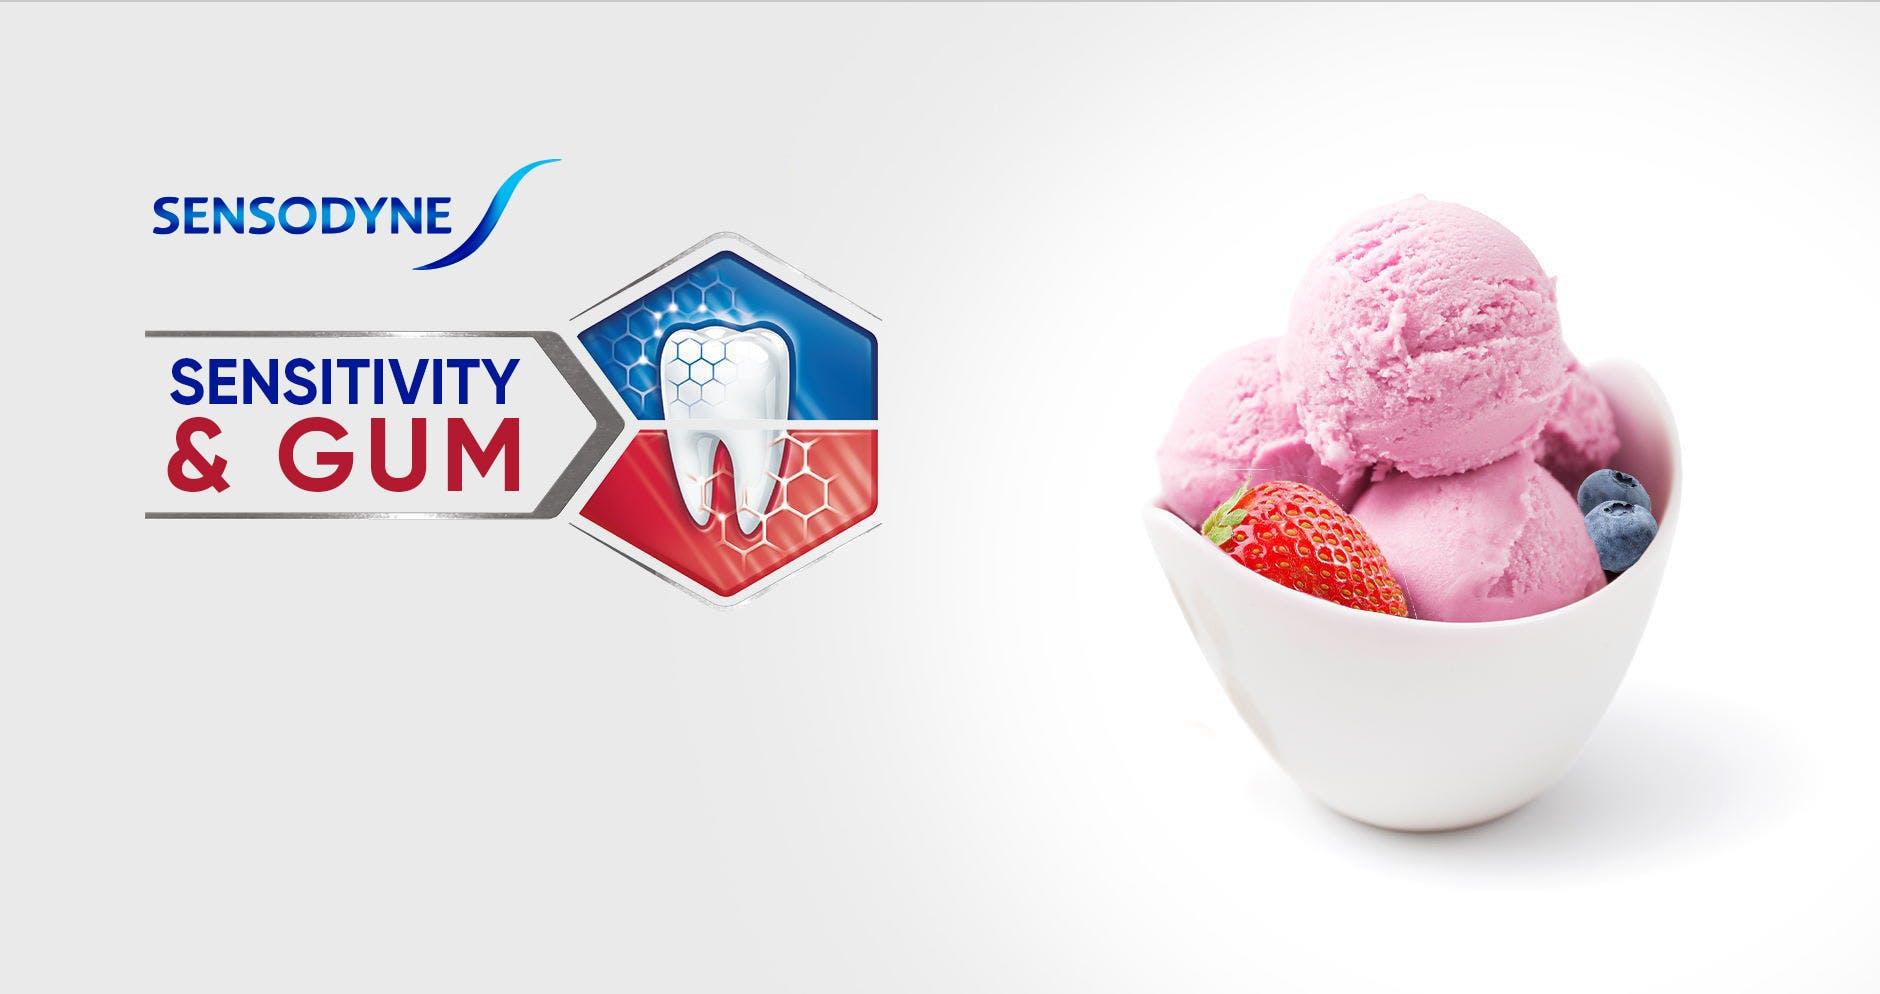 Bowl of ice cream and berries with Sensodyne Sensitivity & Gum logo